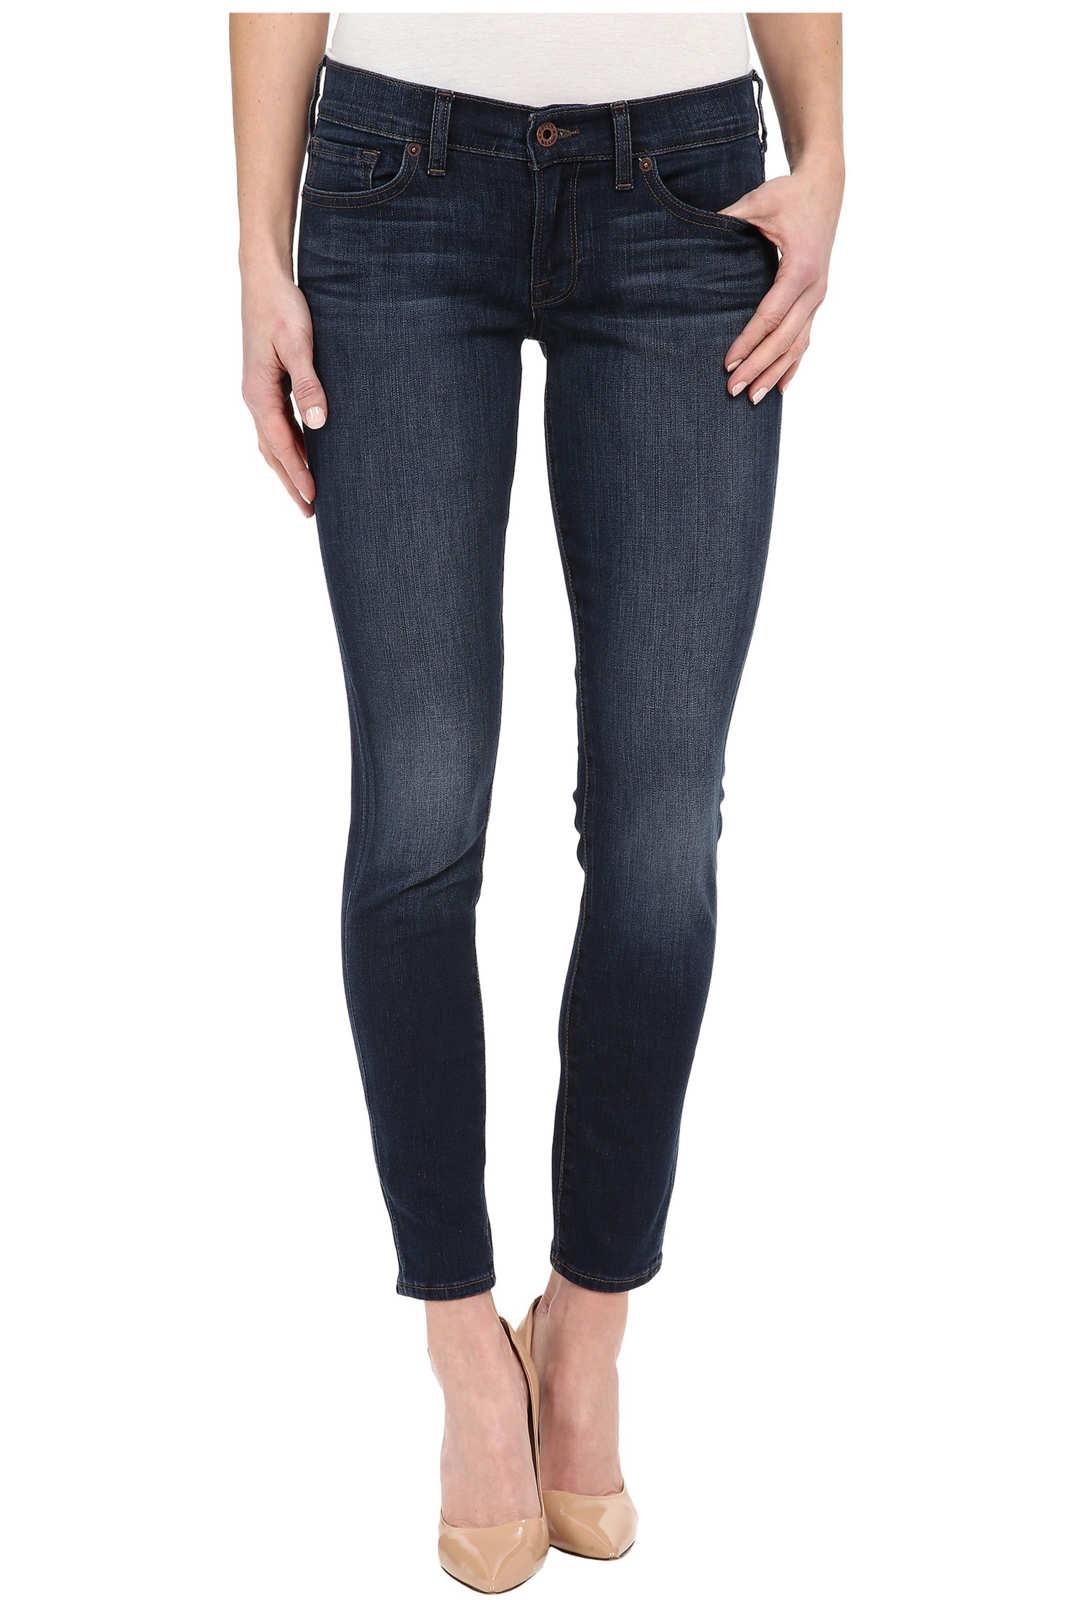 womens jeans best professional jeans. u201c YQUHNWL